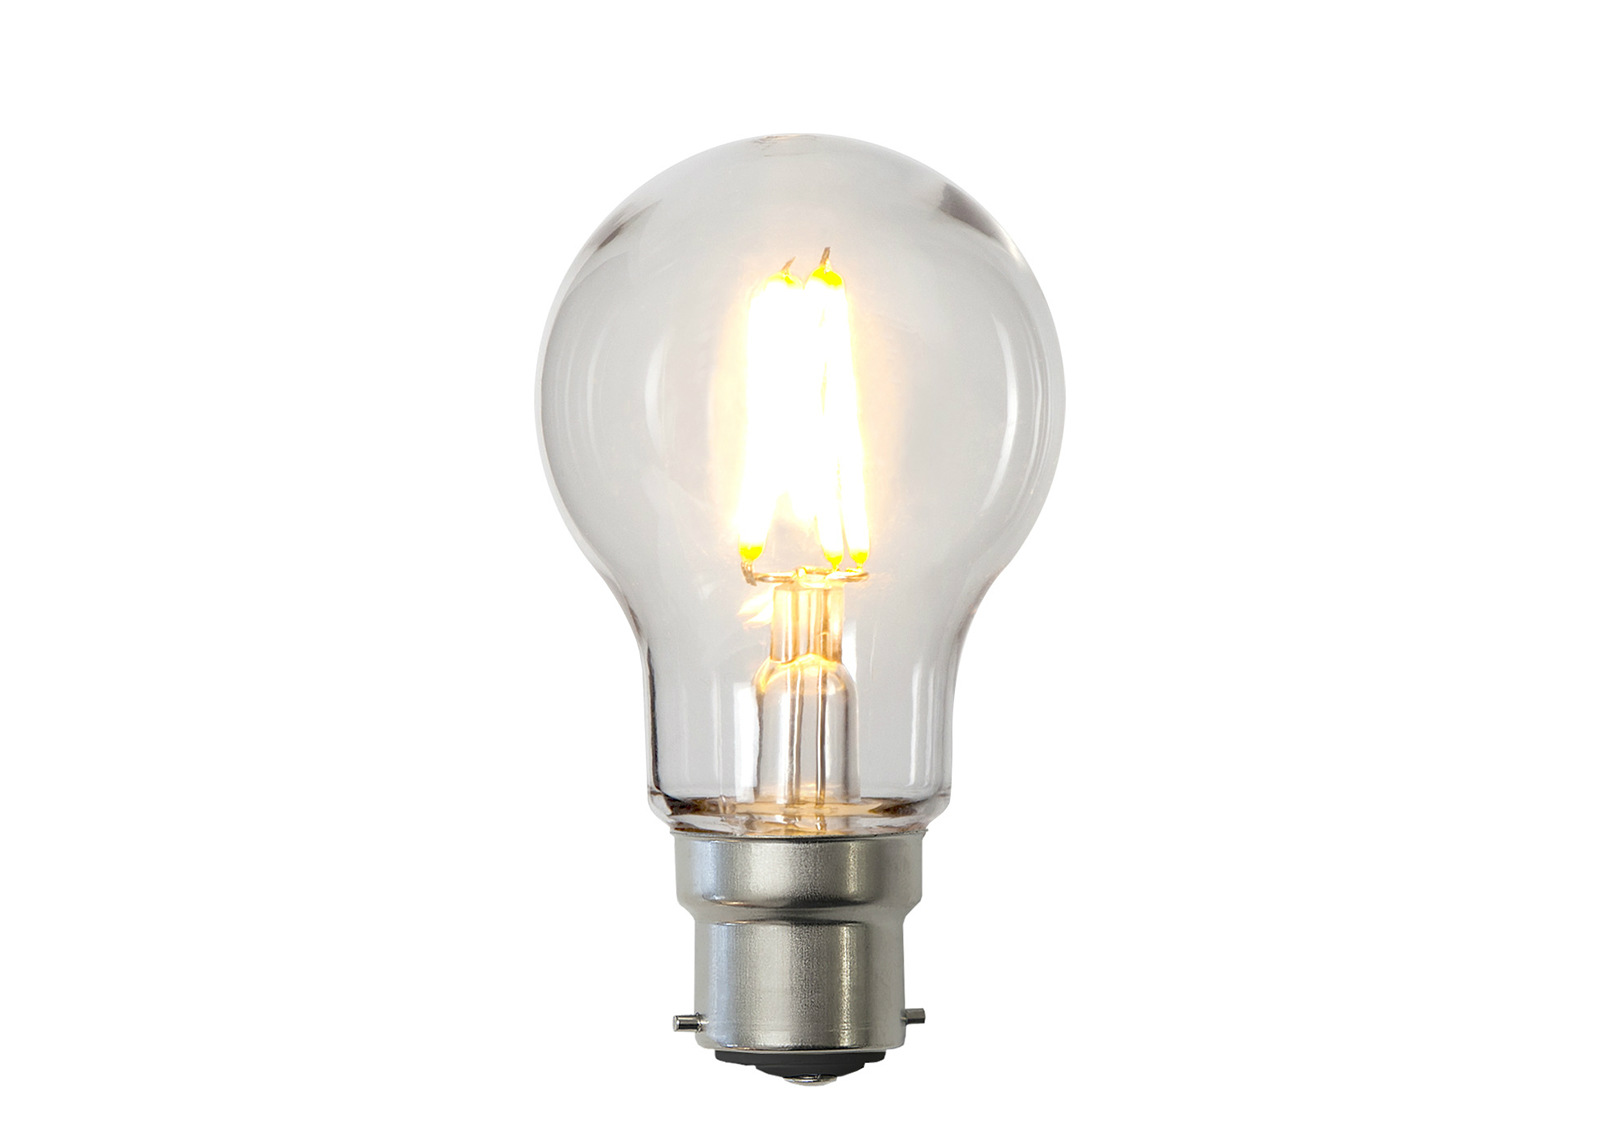 LED sähkölamppu B22 2,4 W